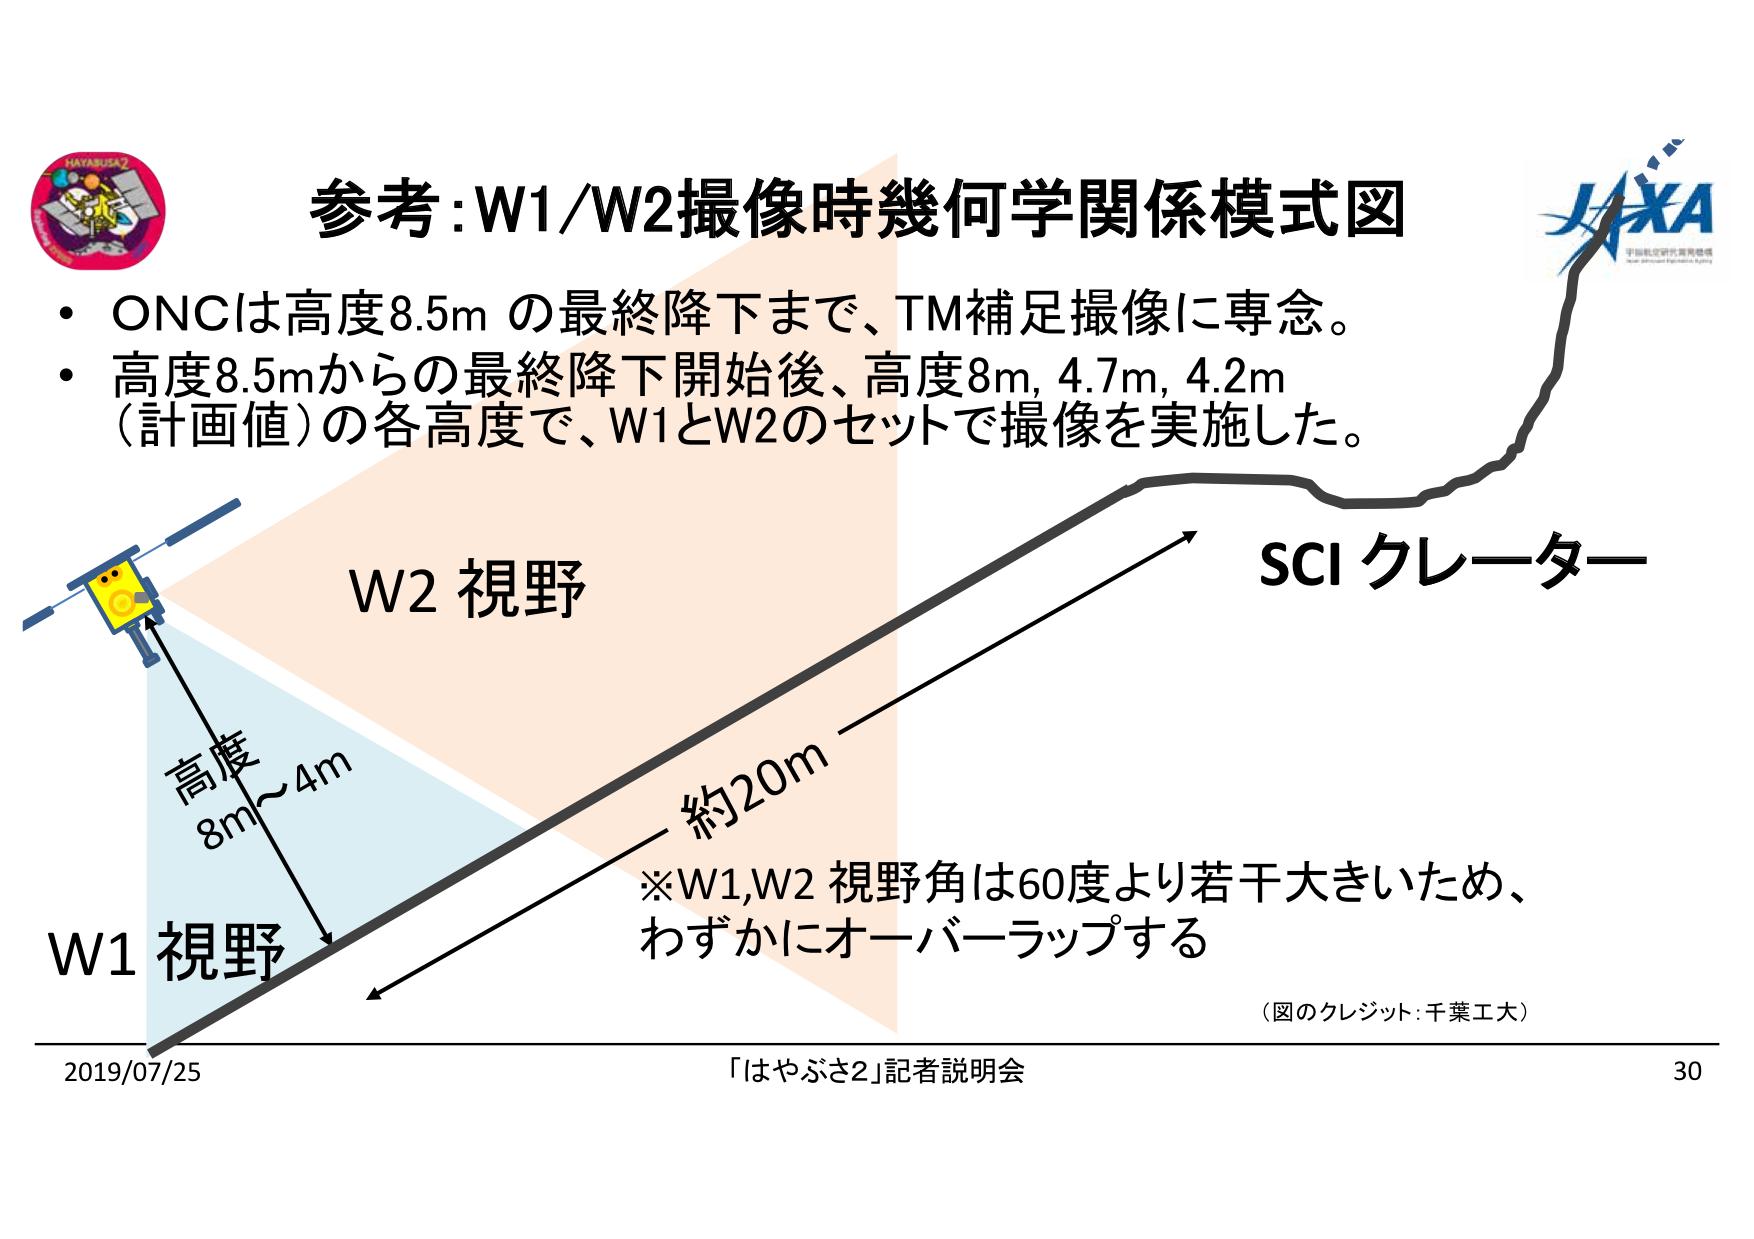 f:id:Imamura:20190725151354p:plain